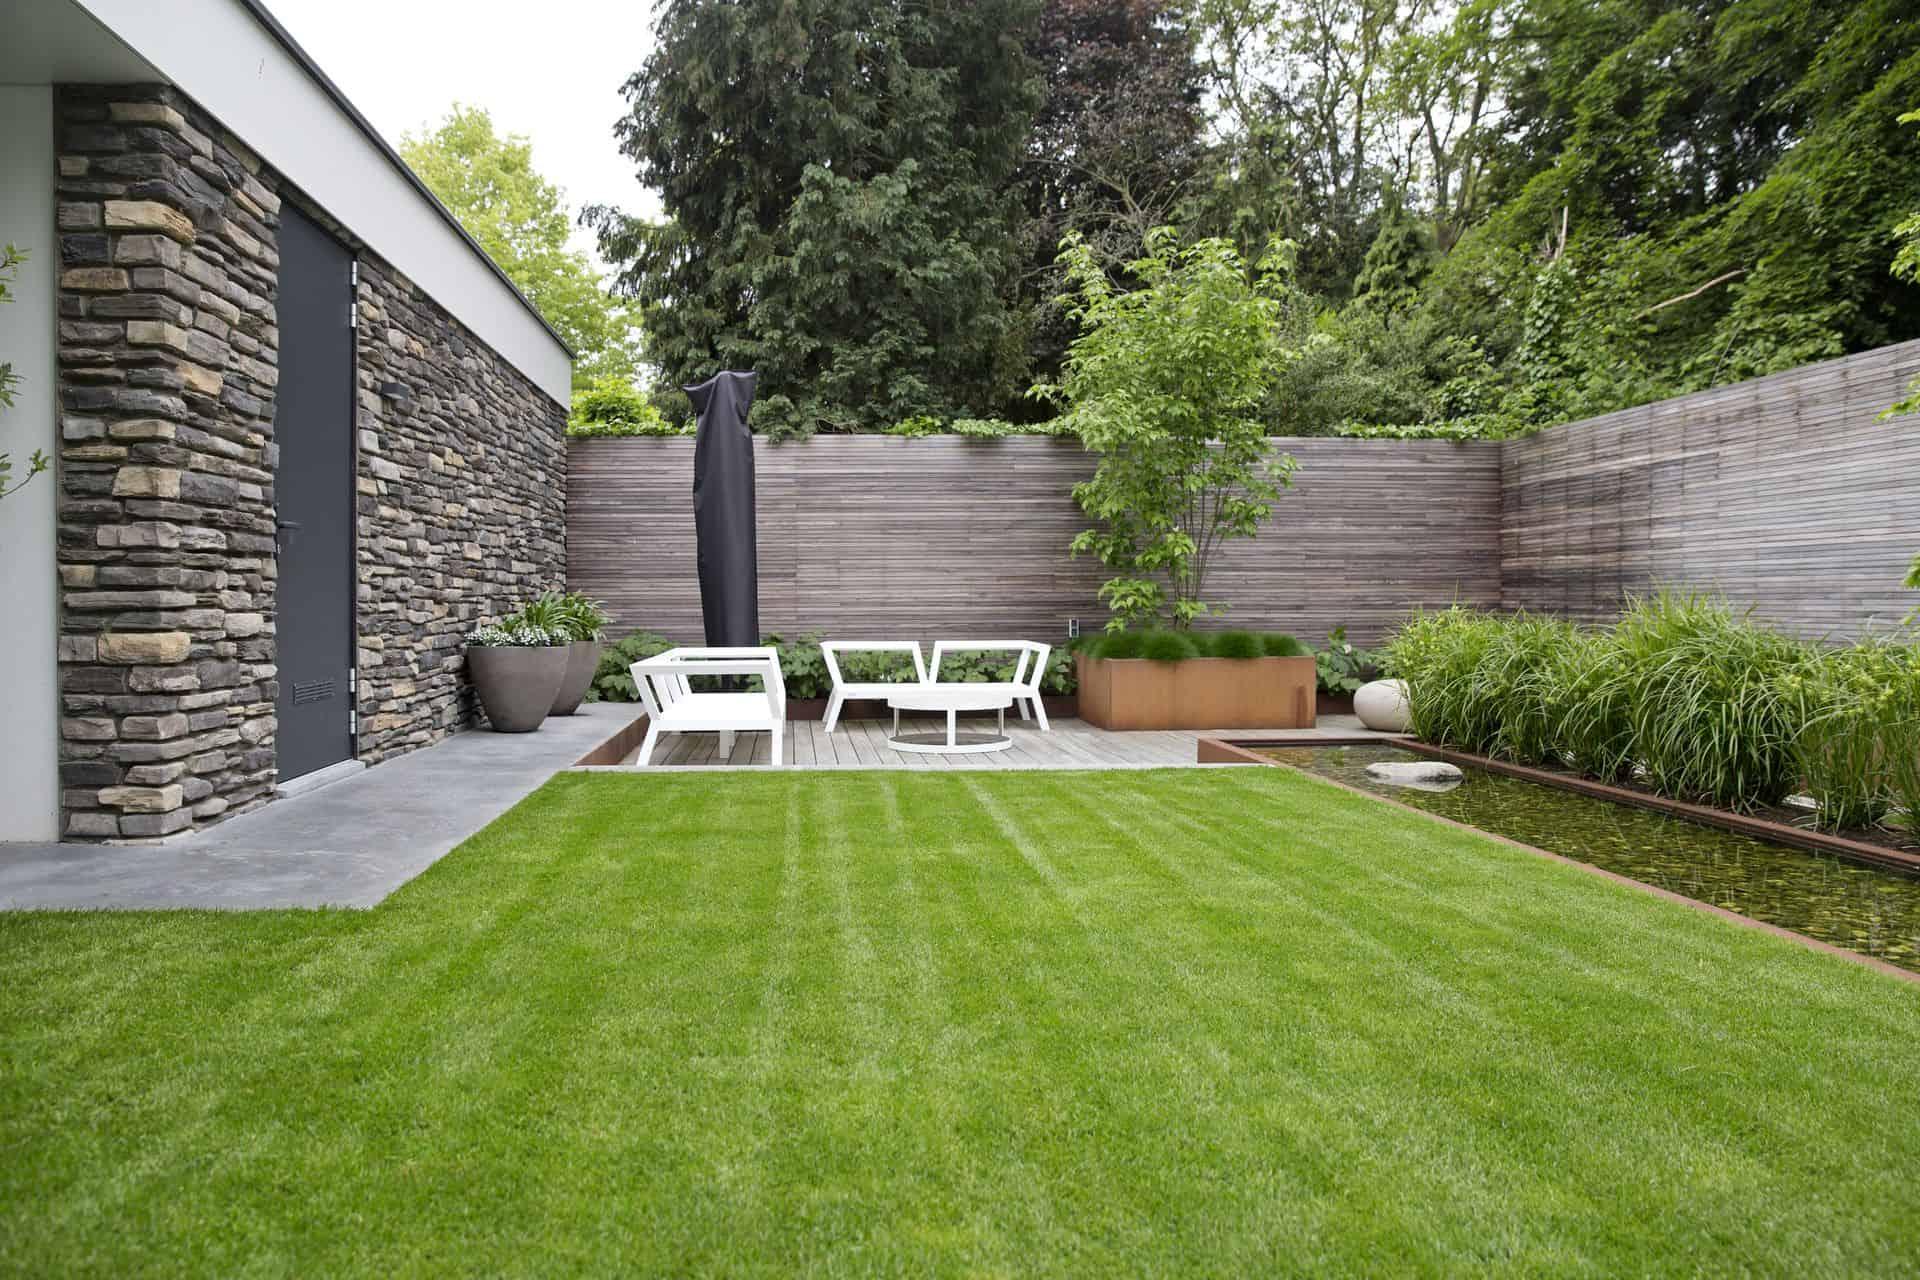 betonnen terrasvloer, tuin met beton